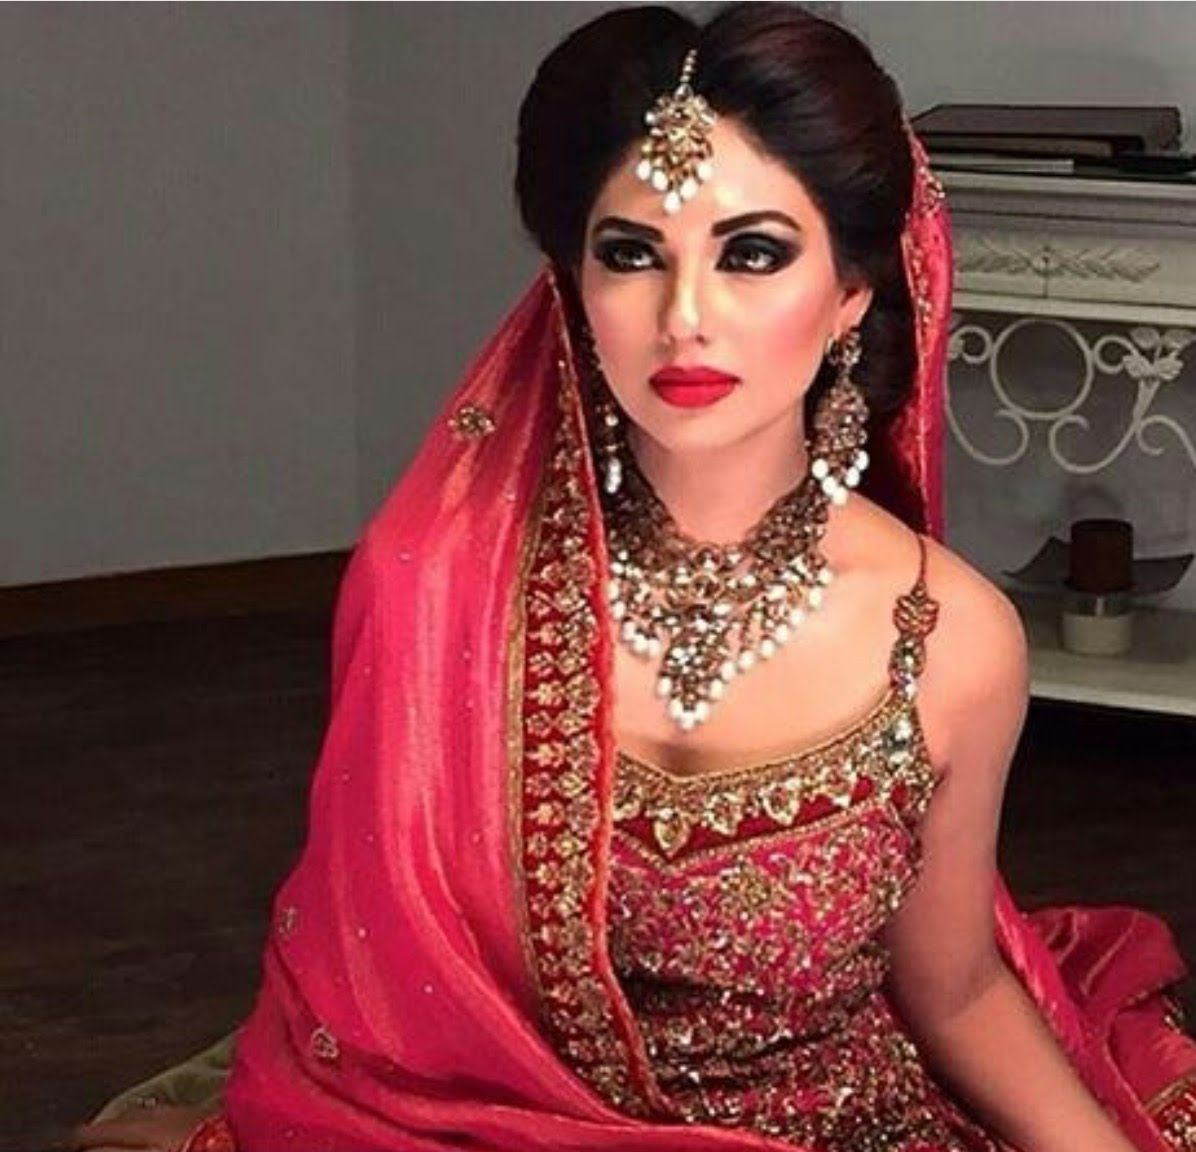 Engagement Hairstyles Pakistani: Pin Von Top Pakistan Auf Top Pakistan